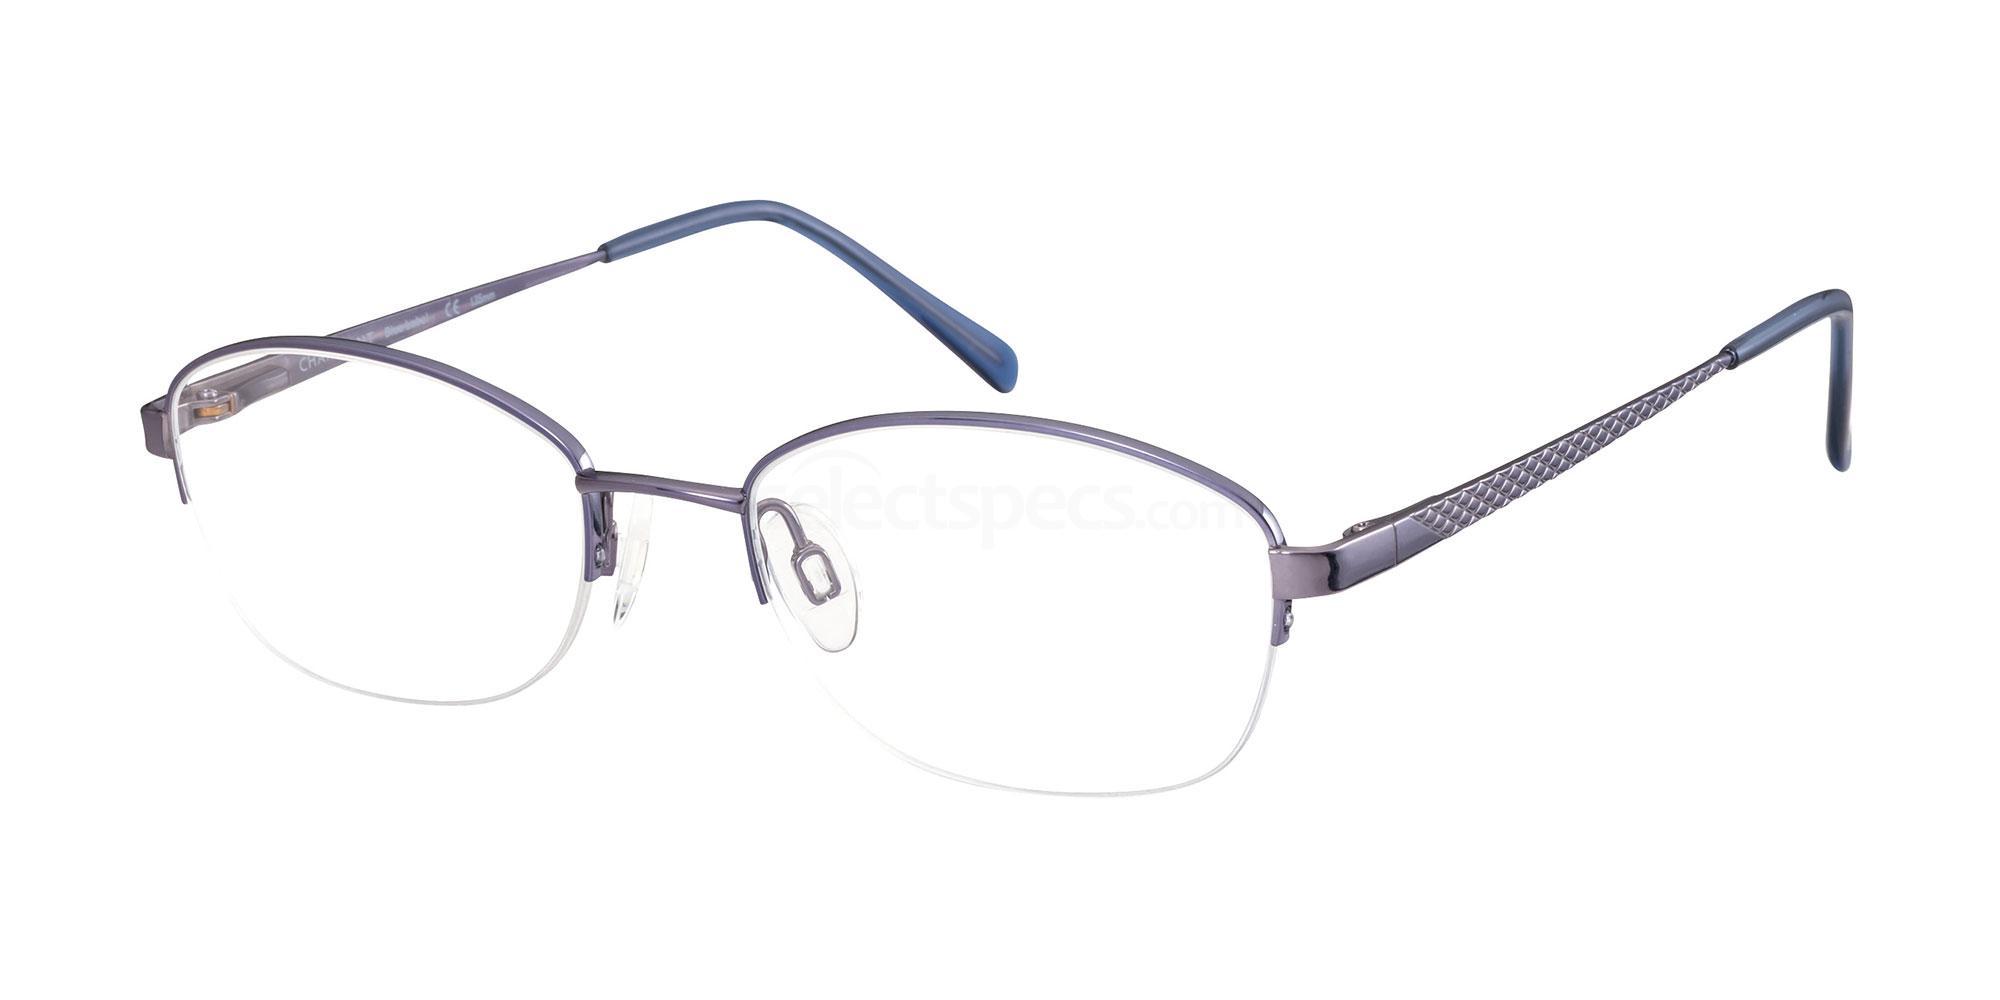 BL CH16043 Glasses, Charmant Blue Label